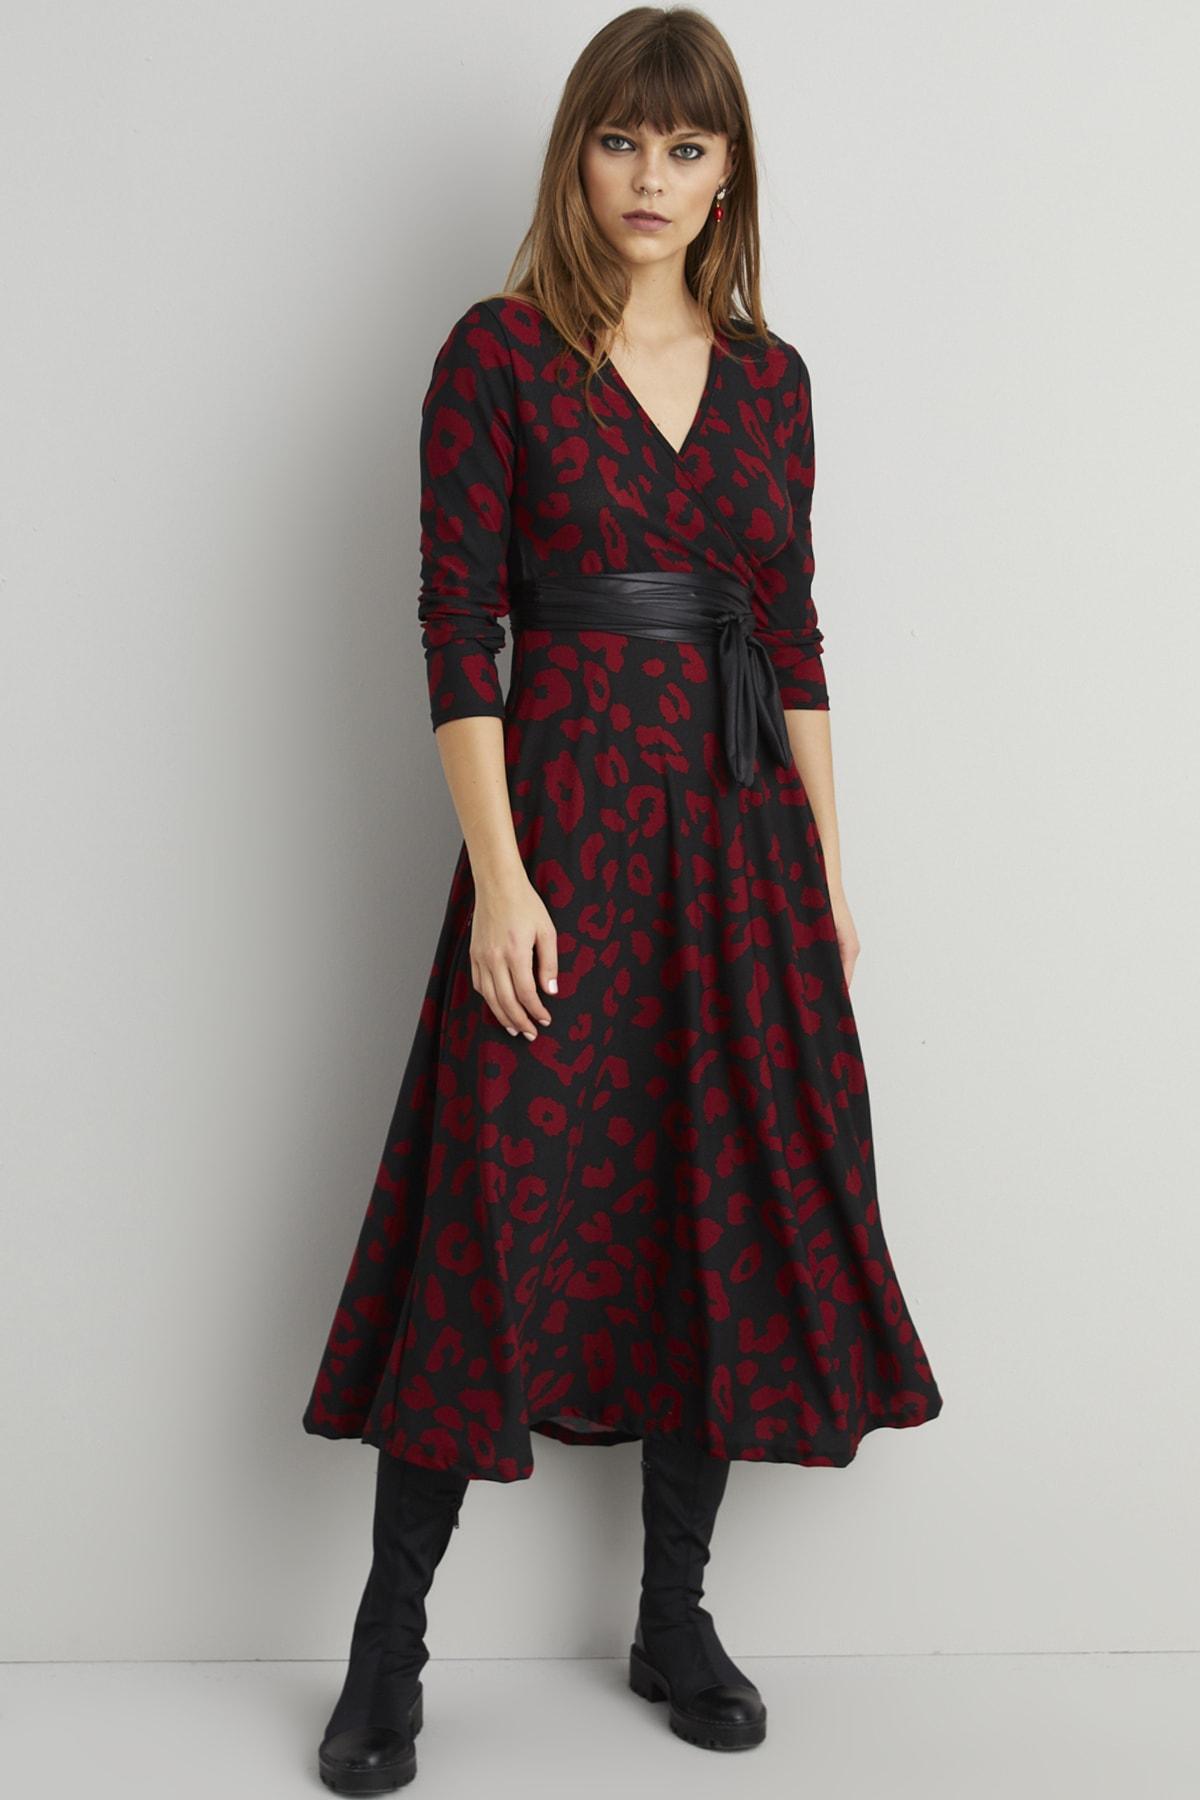 Cool & Sexy Kadın Siyah-Bordo Leopar Desen Kruvaze Maxi Elbise ARZ21 2